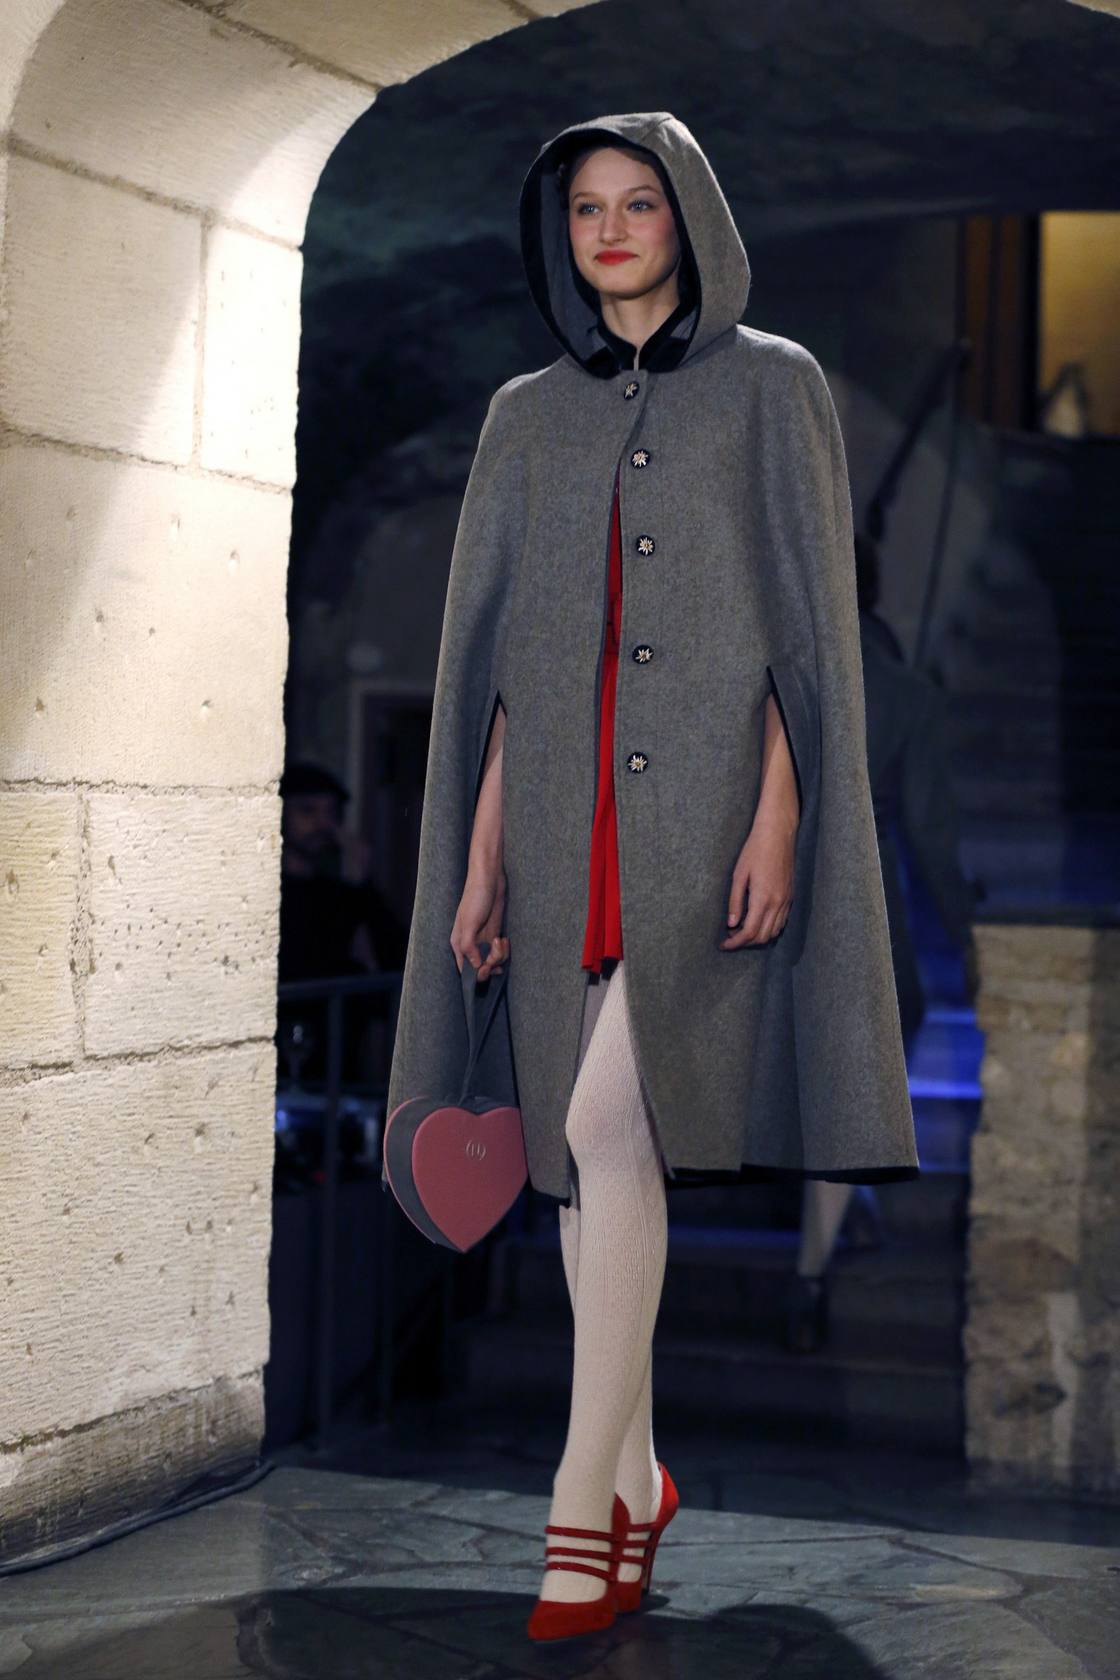 Tercera jornada de la Semana de la Moda de París